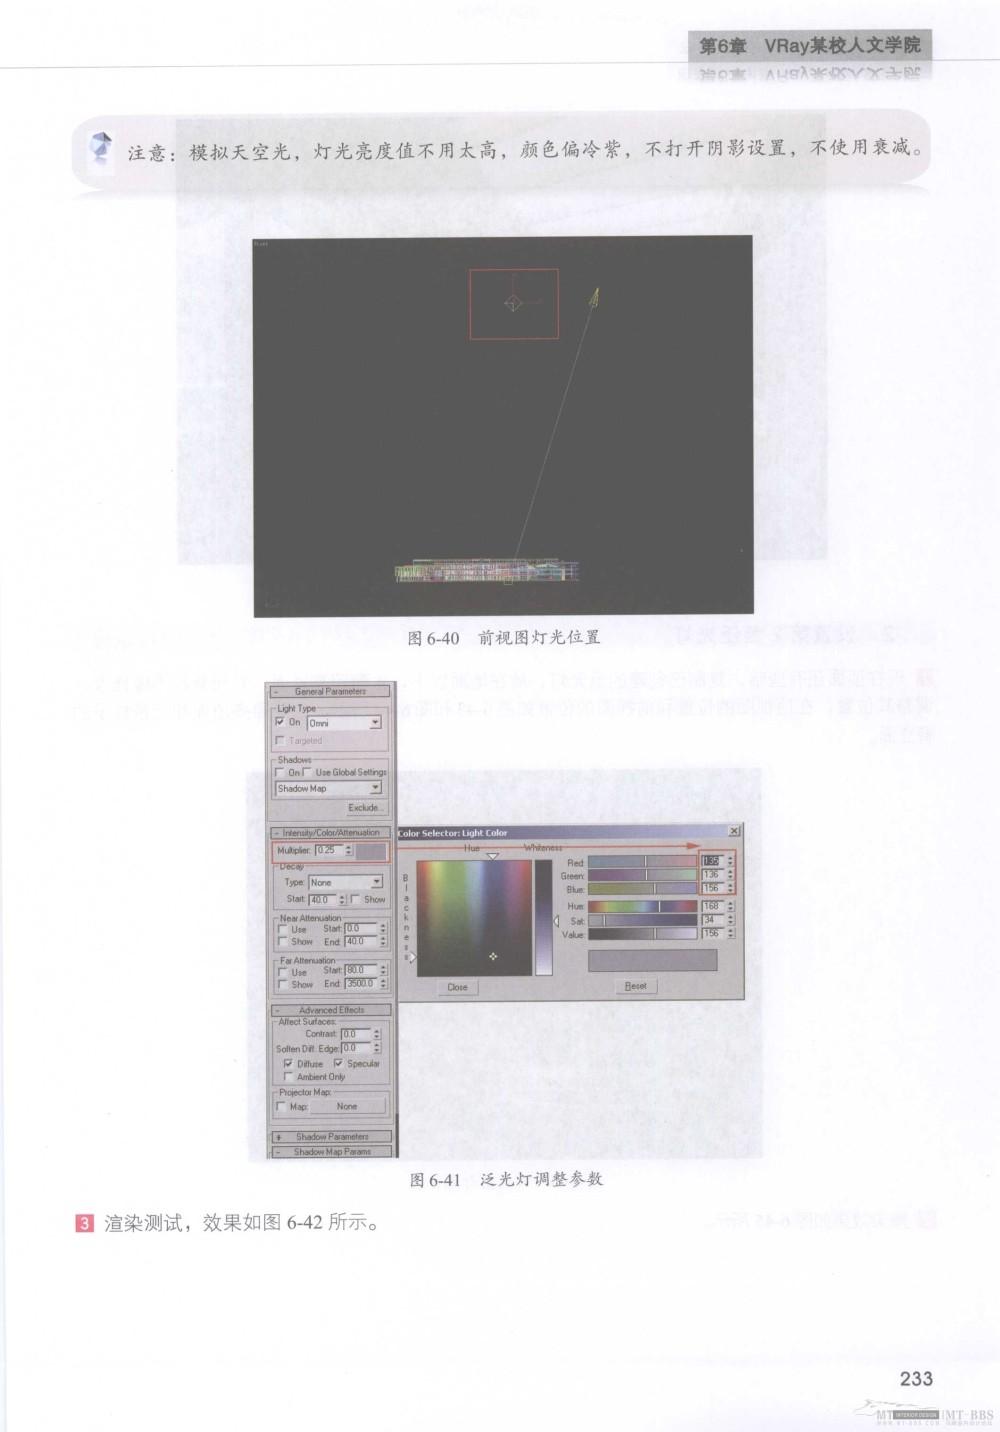 水晶石技法-3ds_Max&VRay室内空间表现_水晶石技法-3ds_Max&VRay室内空间表现_页面_239.jpg